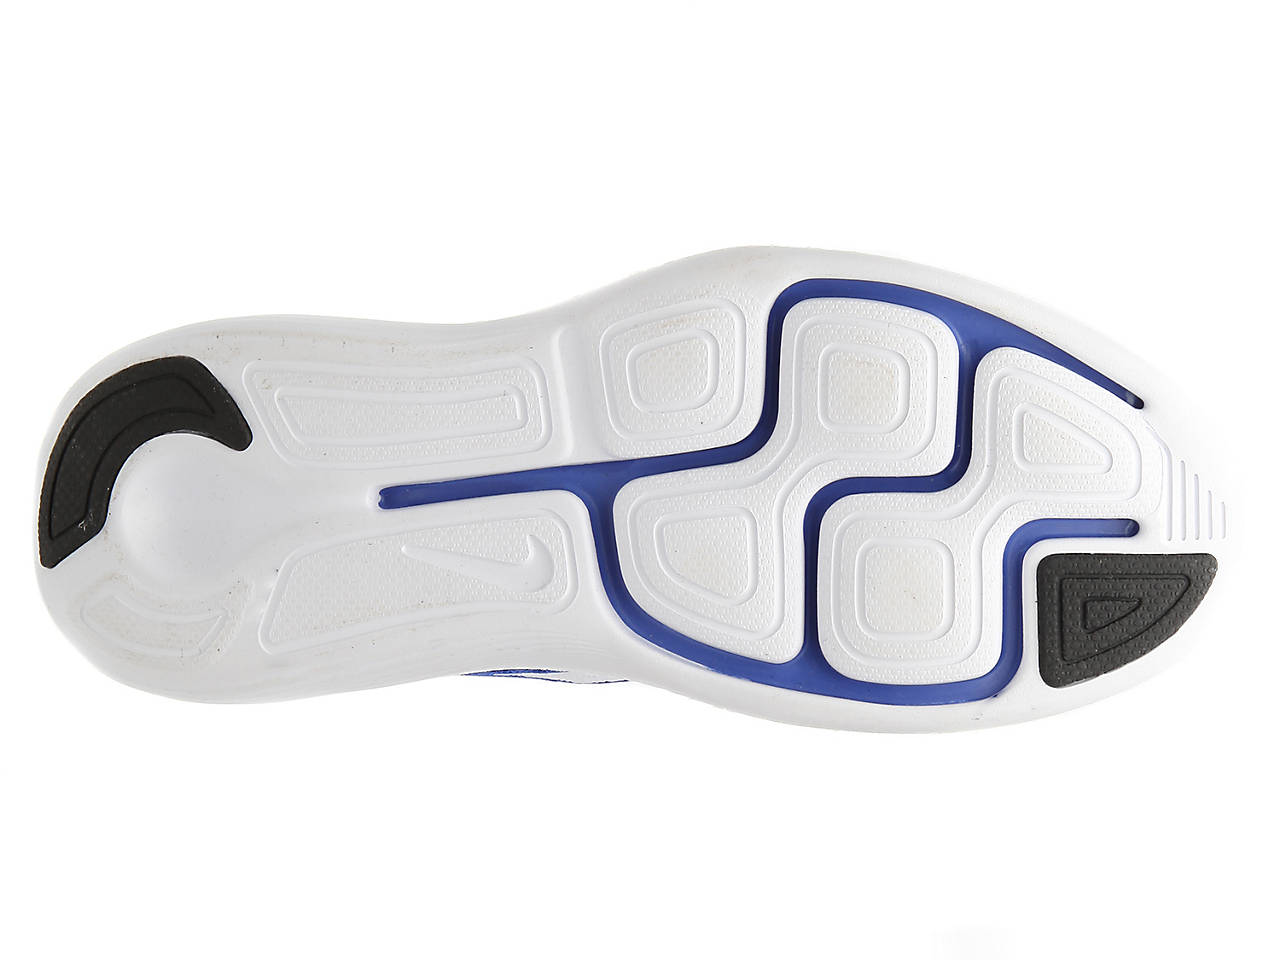 fe7b89df00ac37 Nike Lunarconverge Lightweight Running Shoe - Women s Women s Shoes ...